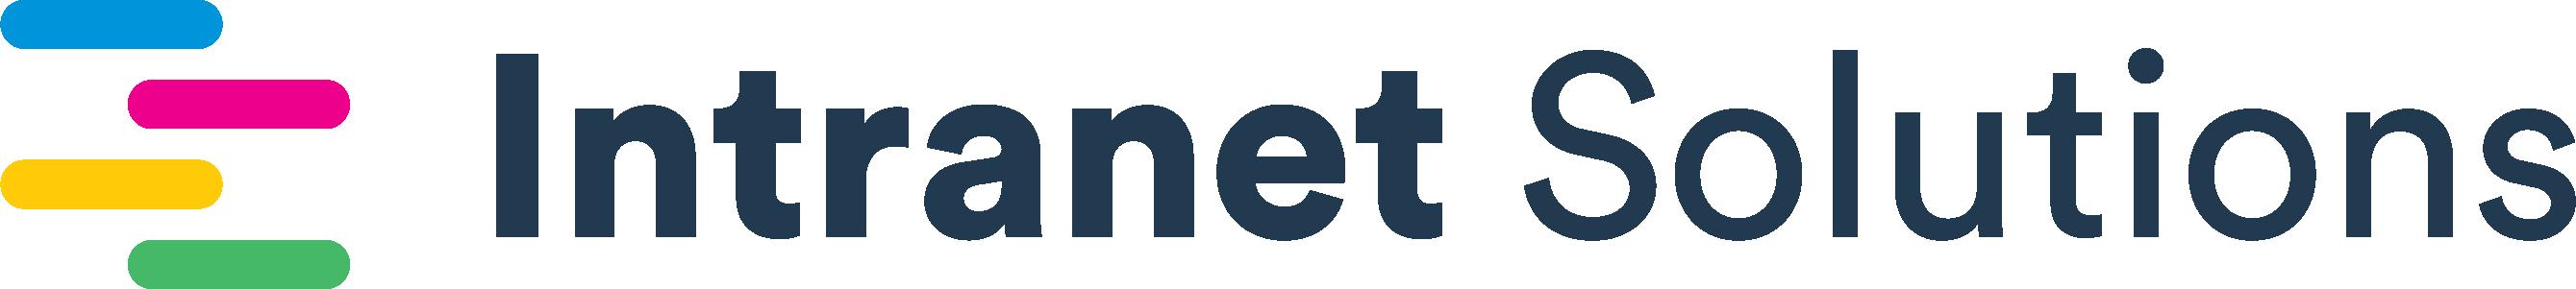 Intranet Solutions Logo